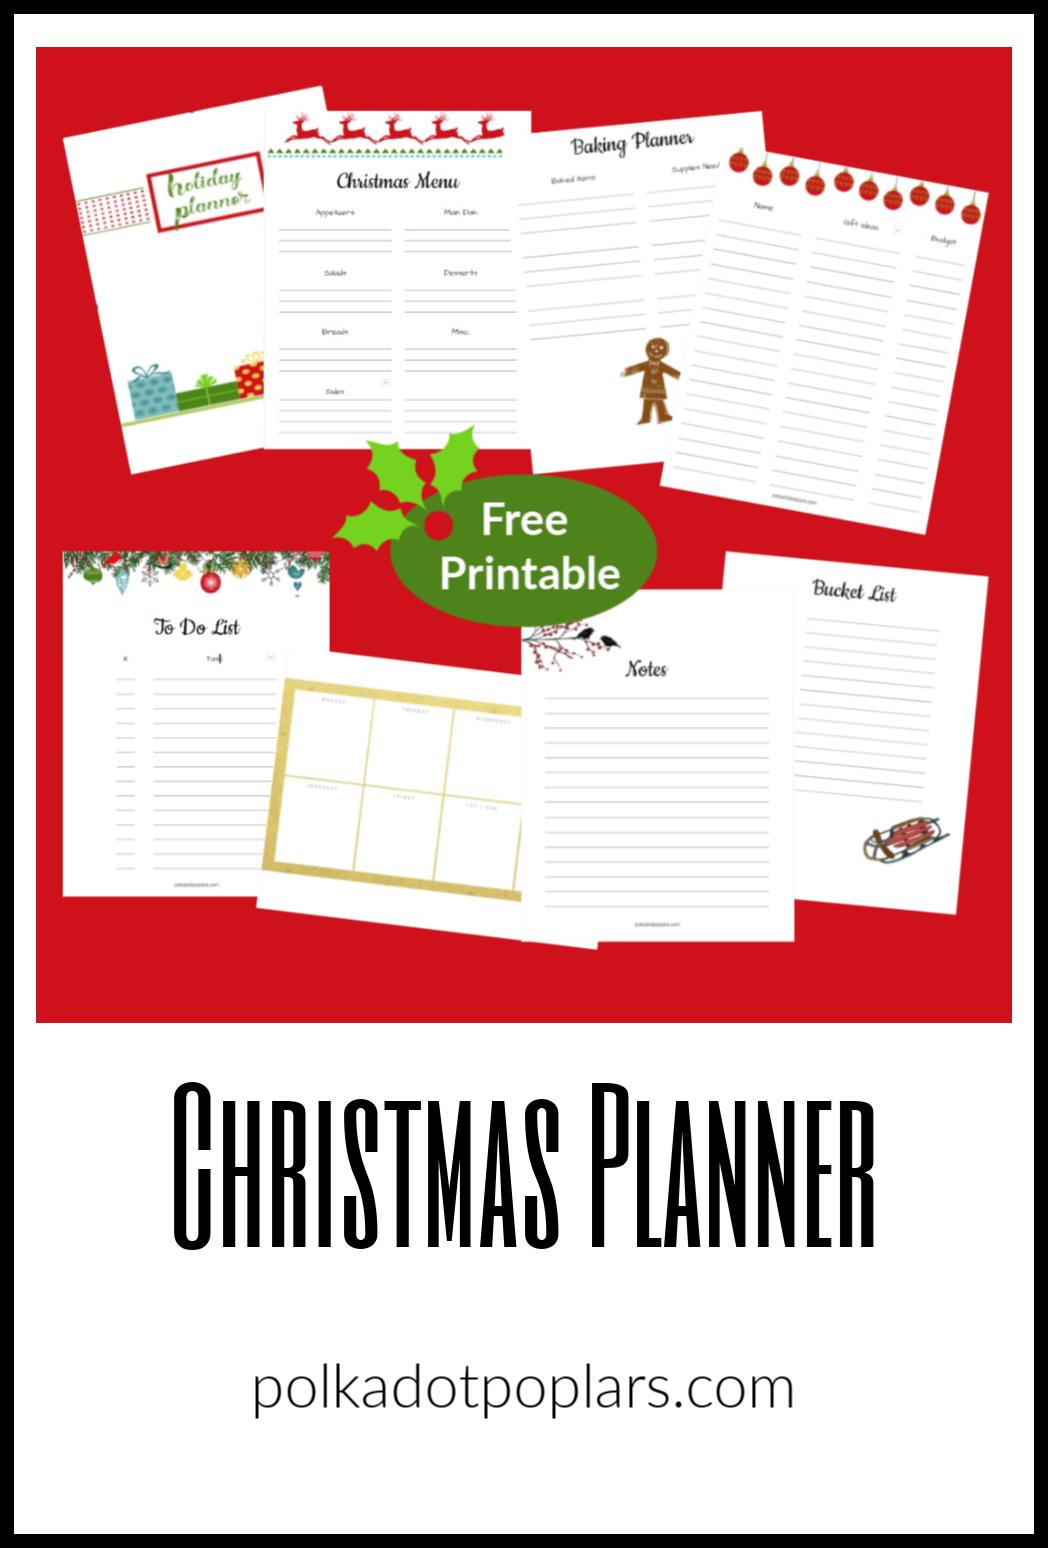 Christmas Planner Pin